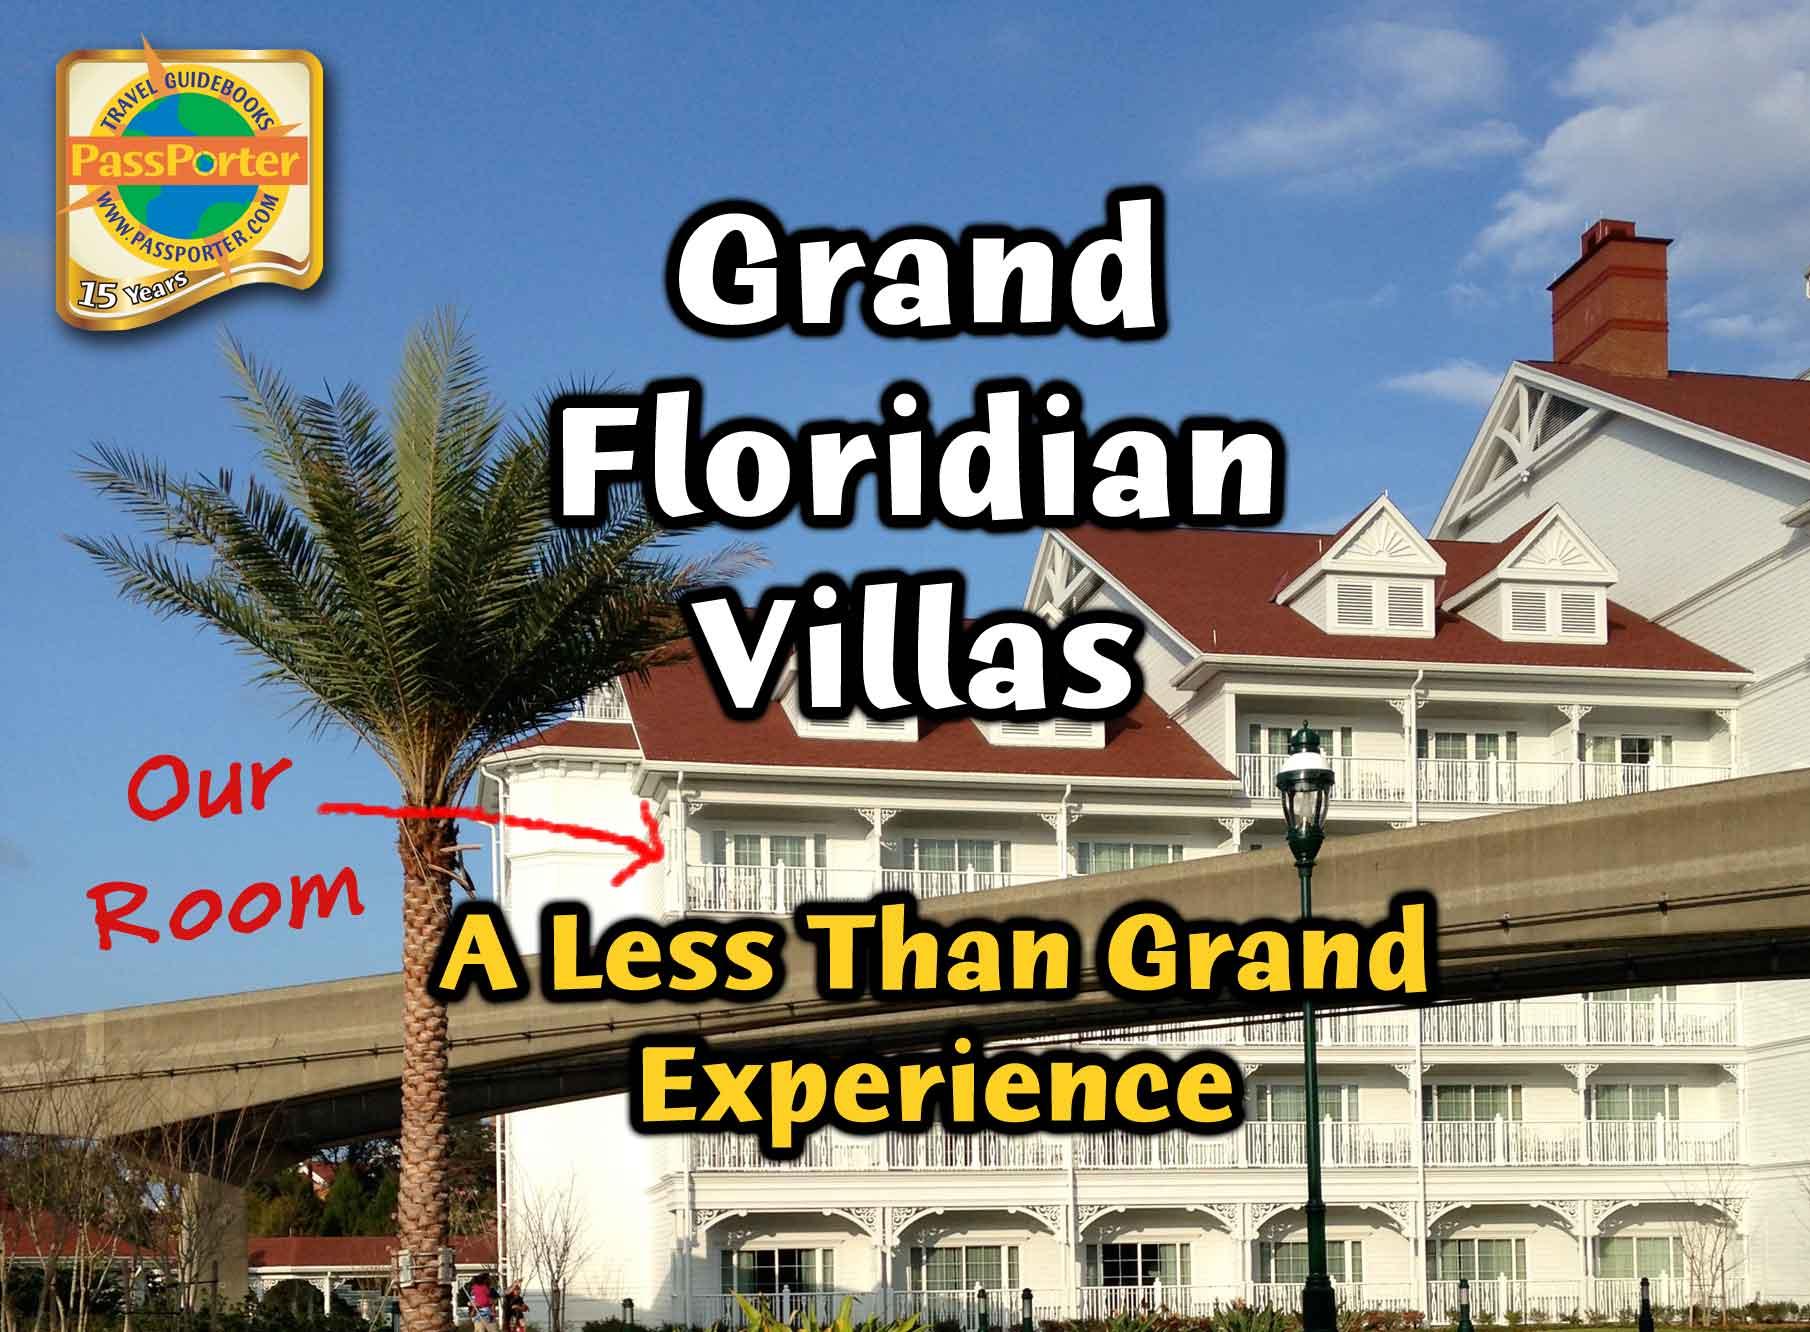 Grand Floridian Villas  A Less Than Grand Experience   PassPorter Blogs. Grand Floridian Villas  A Less Than Grand Experience   PassPorter